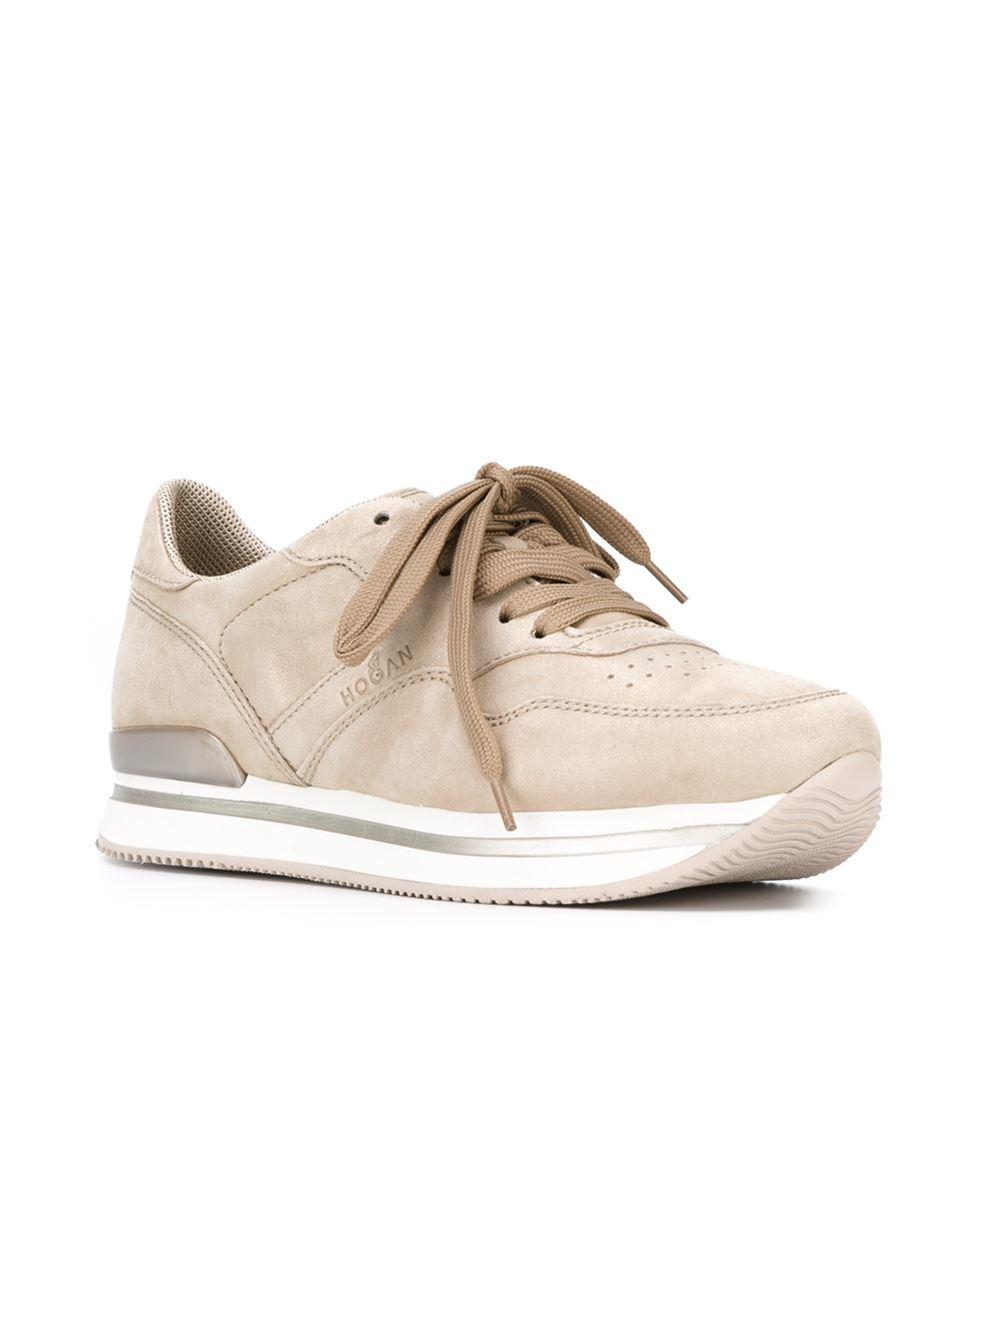 H222 sneakers - Metallic Hogan xsfkH